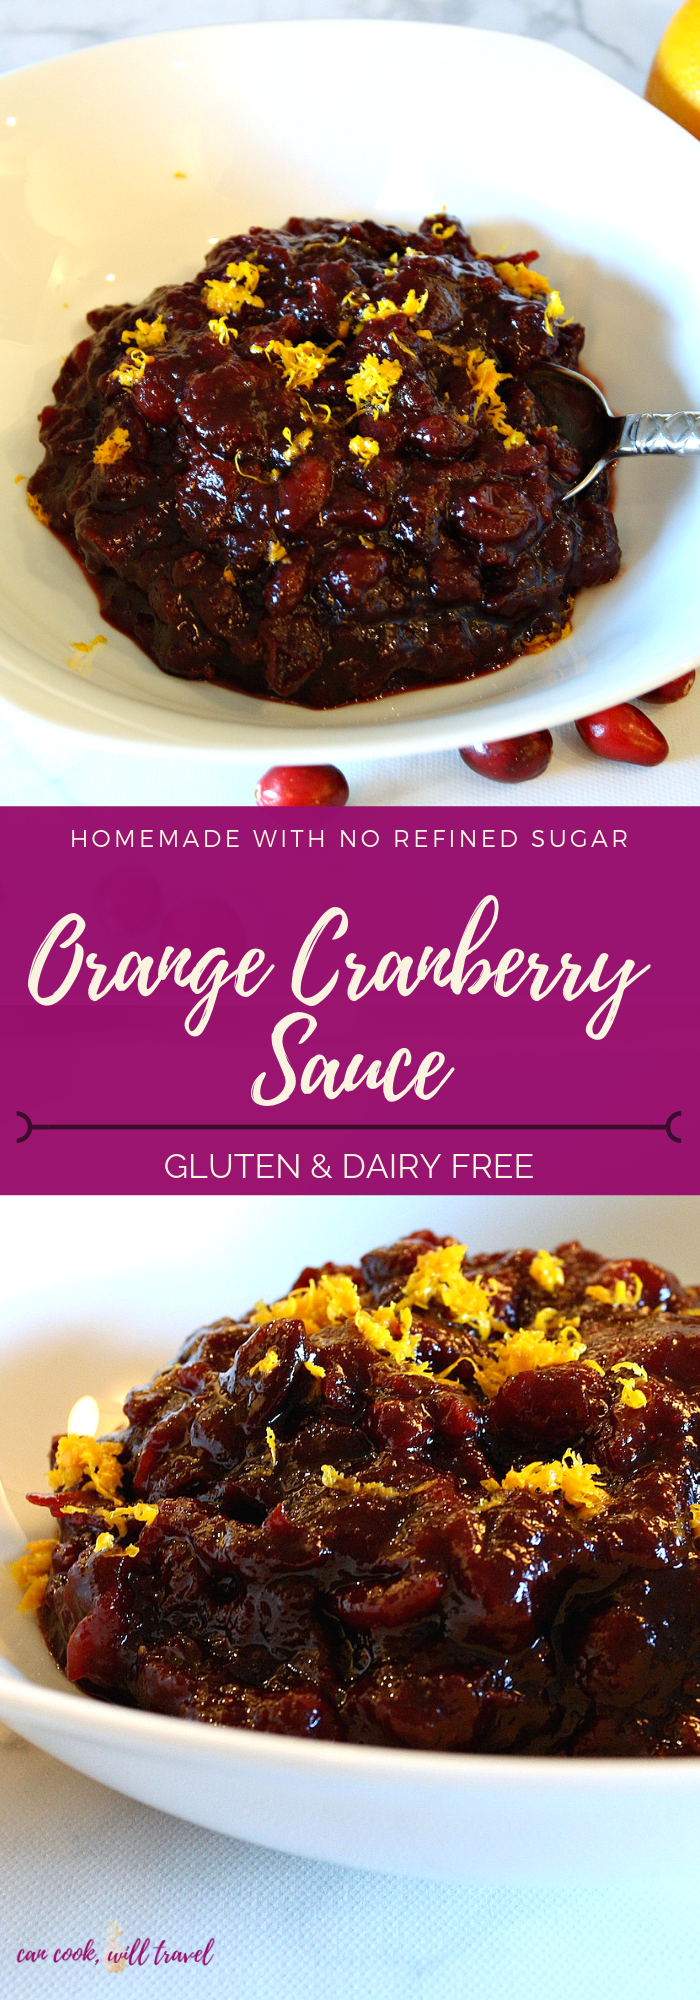 Orange Cranberry Sauce_Collage1